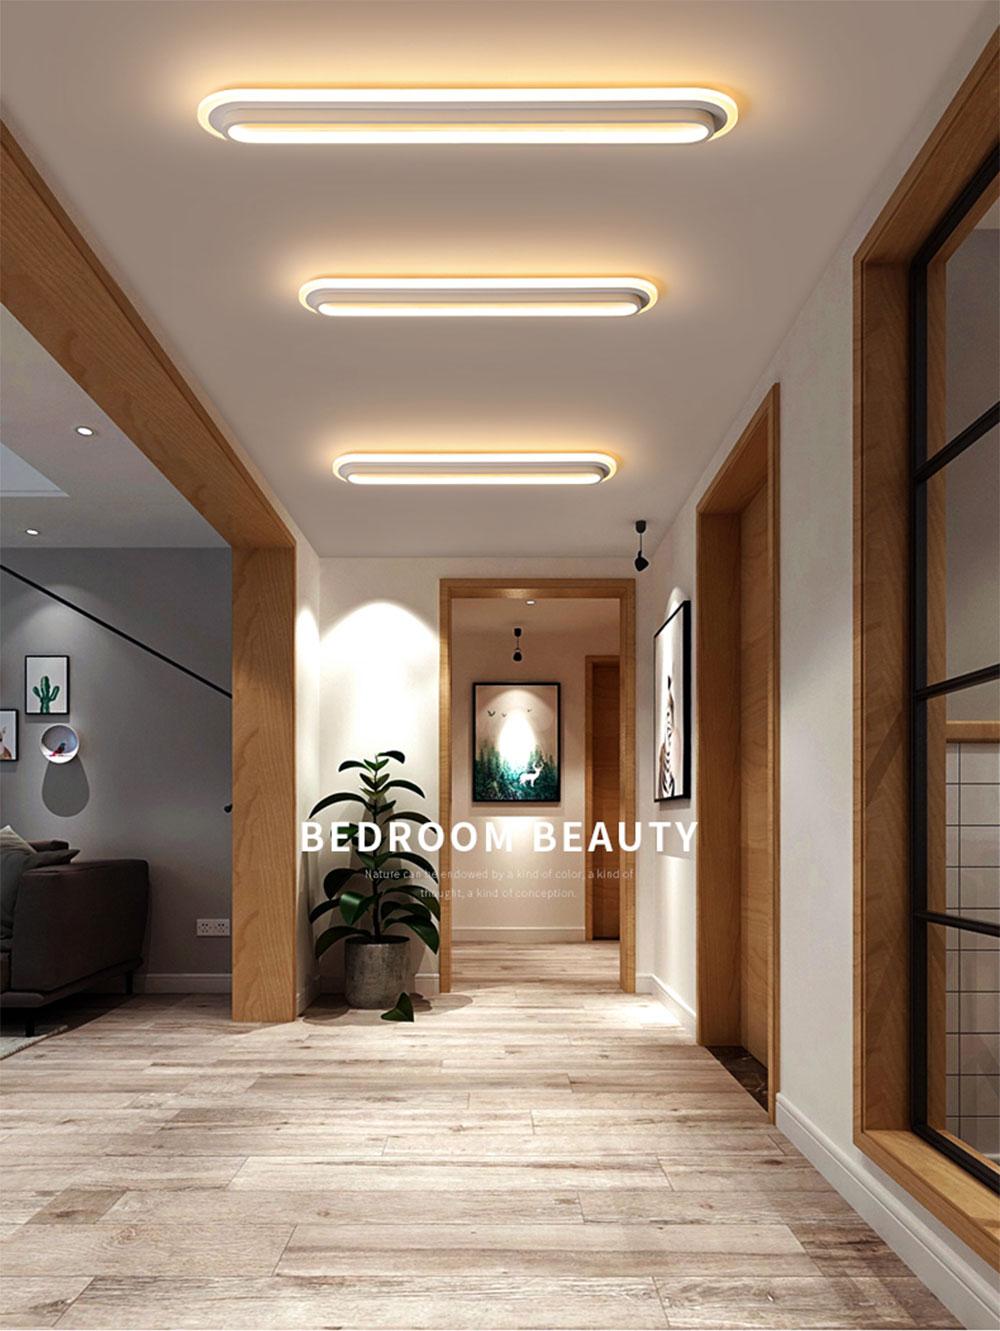 HTB1rhAjaBCw3KVjSZFuq6AAOpXaP Modern Led Ceiling Lights For Living Room Bedroom Study Room Corridor White black color surface mounted Ceiling Lamp AC85-265V